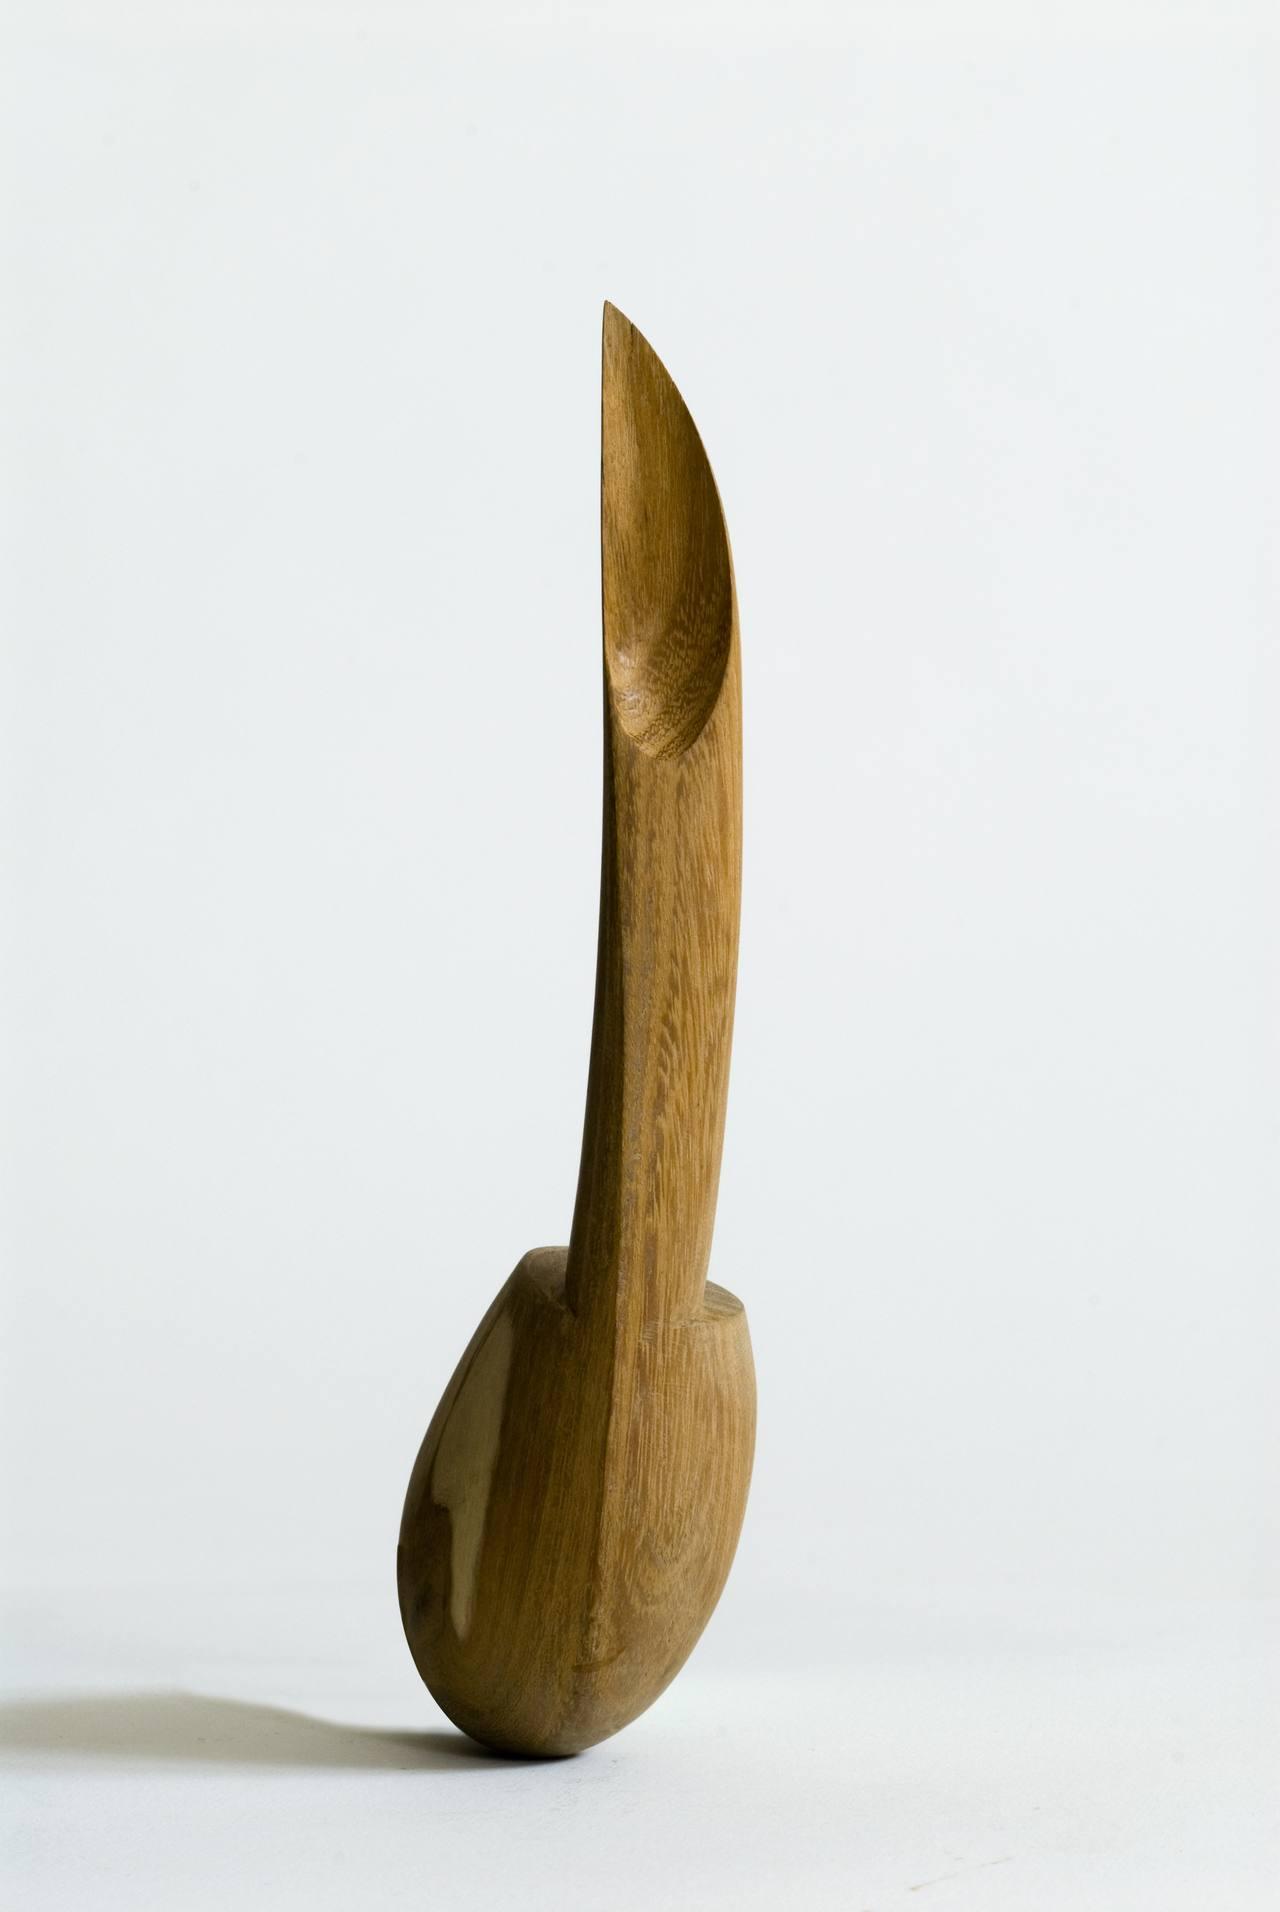 'EVA'S APPLE CORER' / 1990 / study Design Academy Eindhoven